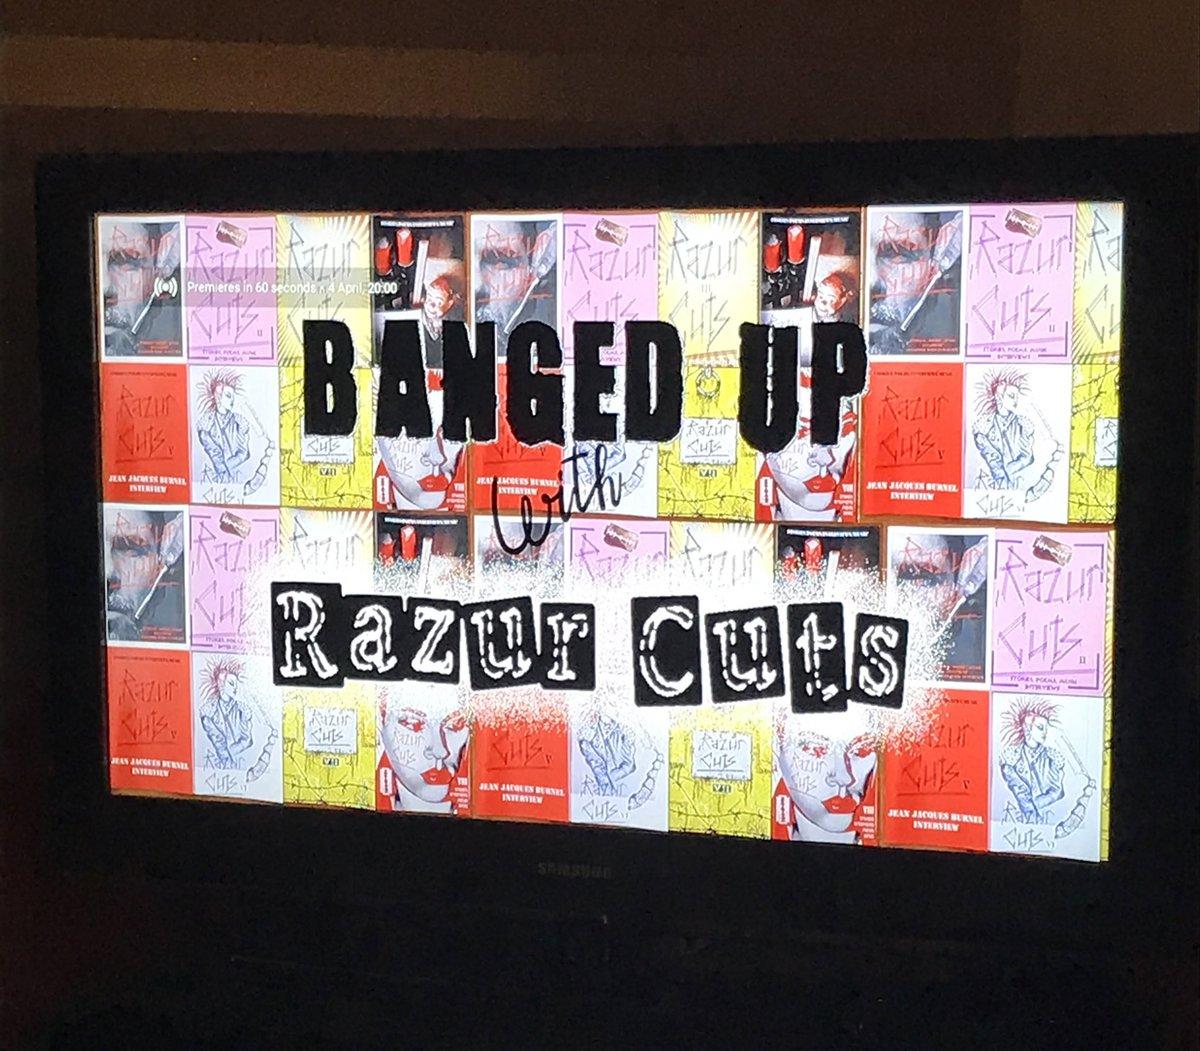 Tonight's entertainment part 1 - banged up with @razurcutsmag on @YouTube 8pm #StayAtHome #stayhomebands